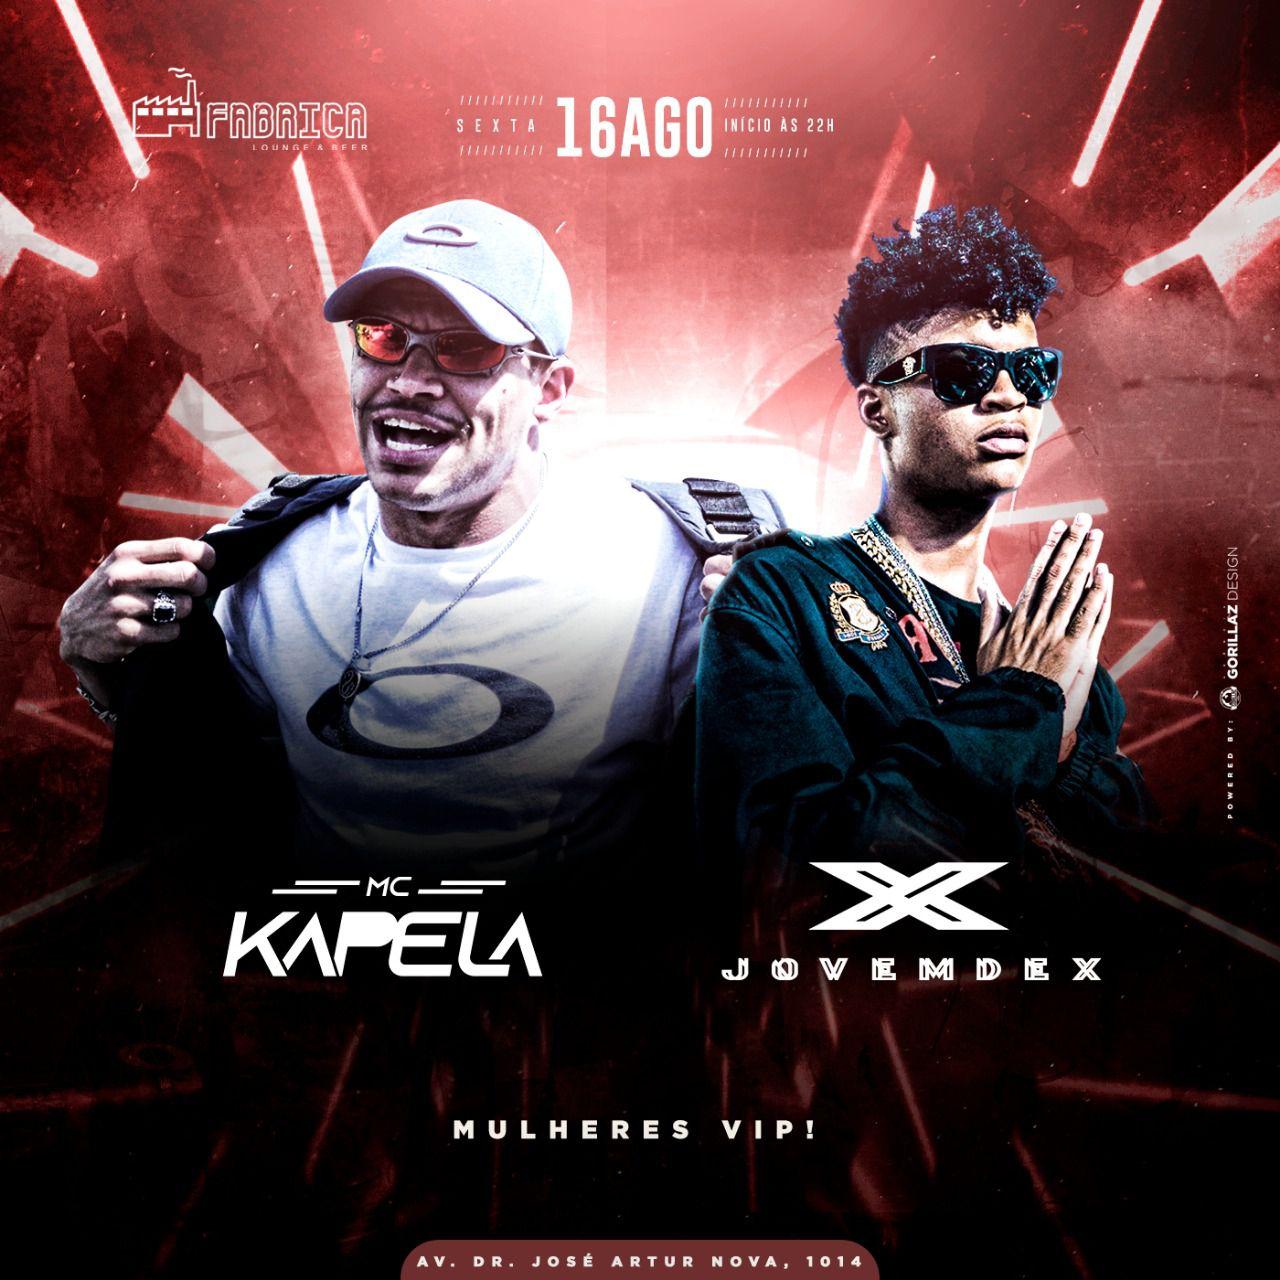 Jovem Dex - Fabrica Lounge - 16/08/19 - São Paulo - SP